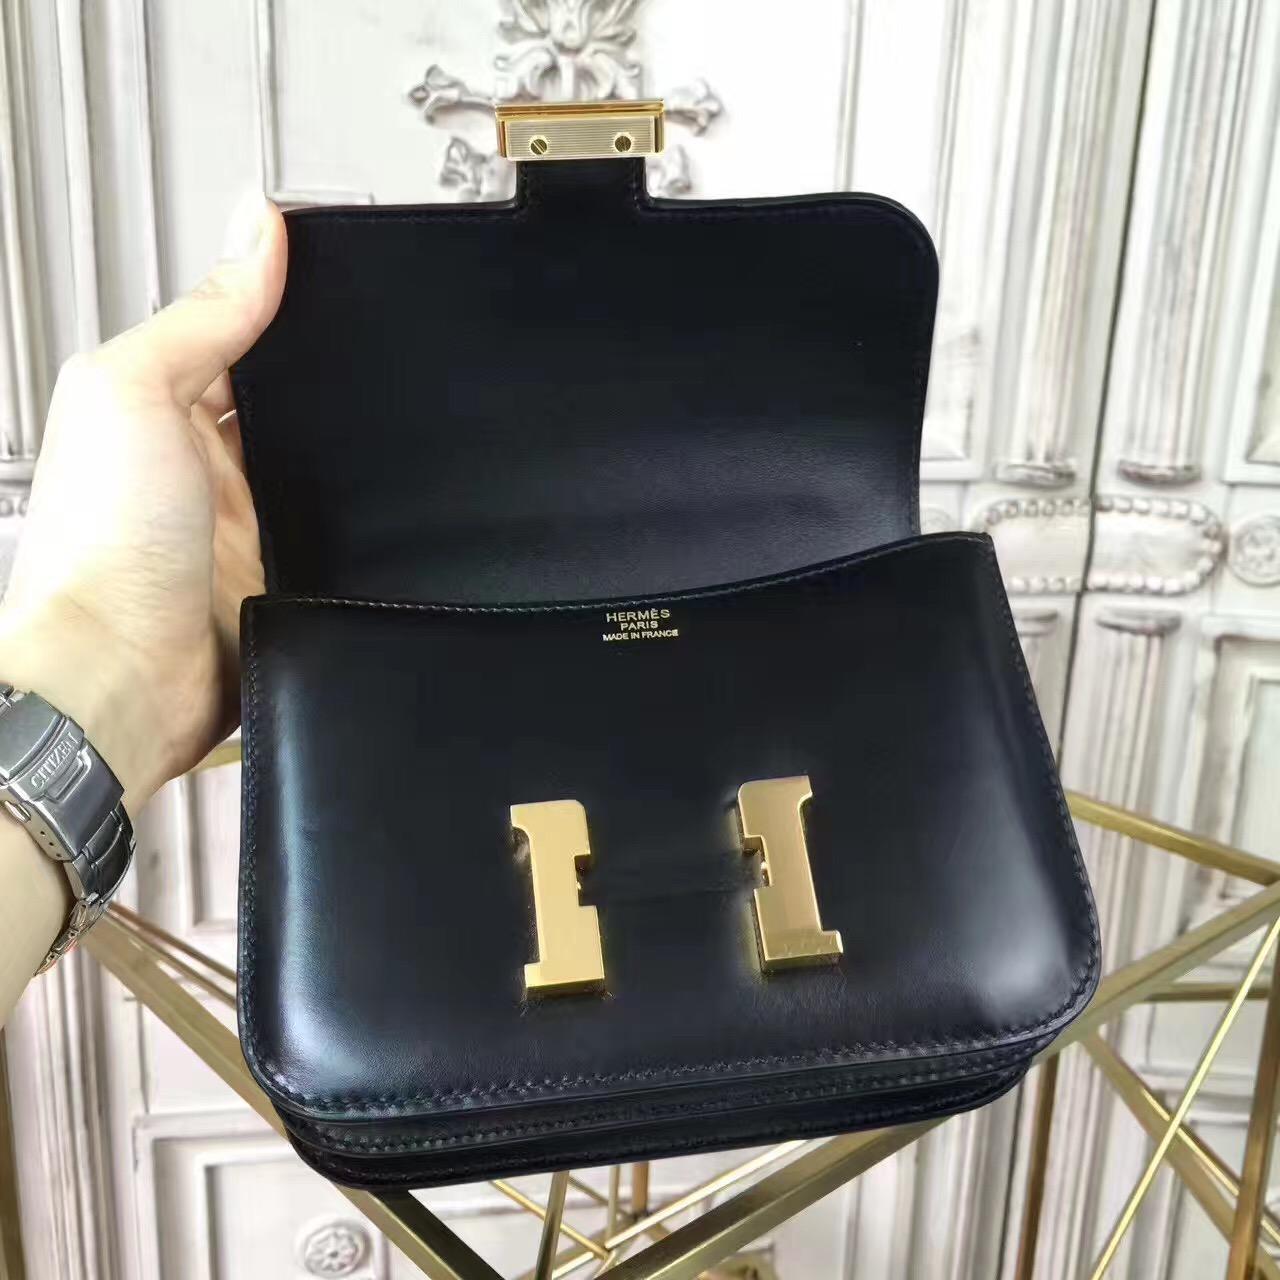 aee0ef26ae54 Hermes original box leather small constance bag C019 black